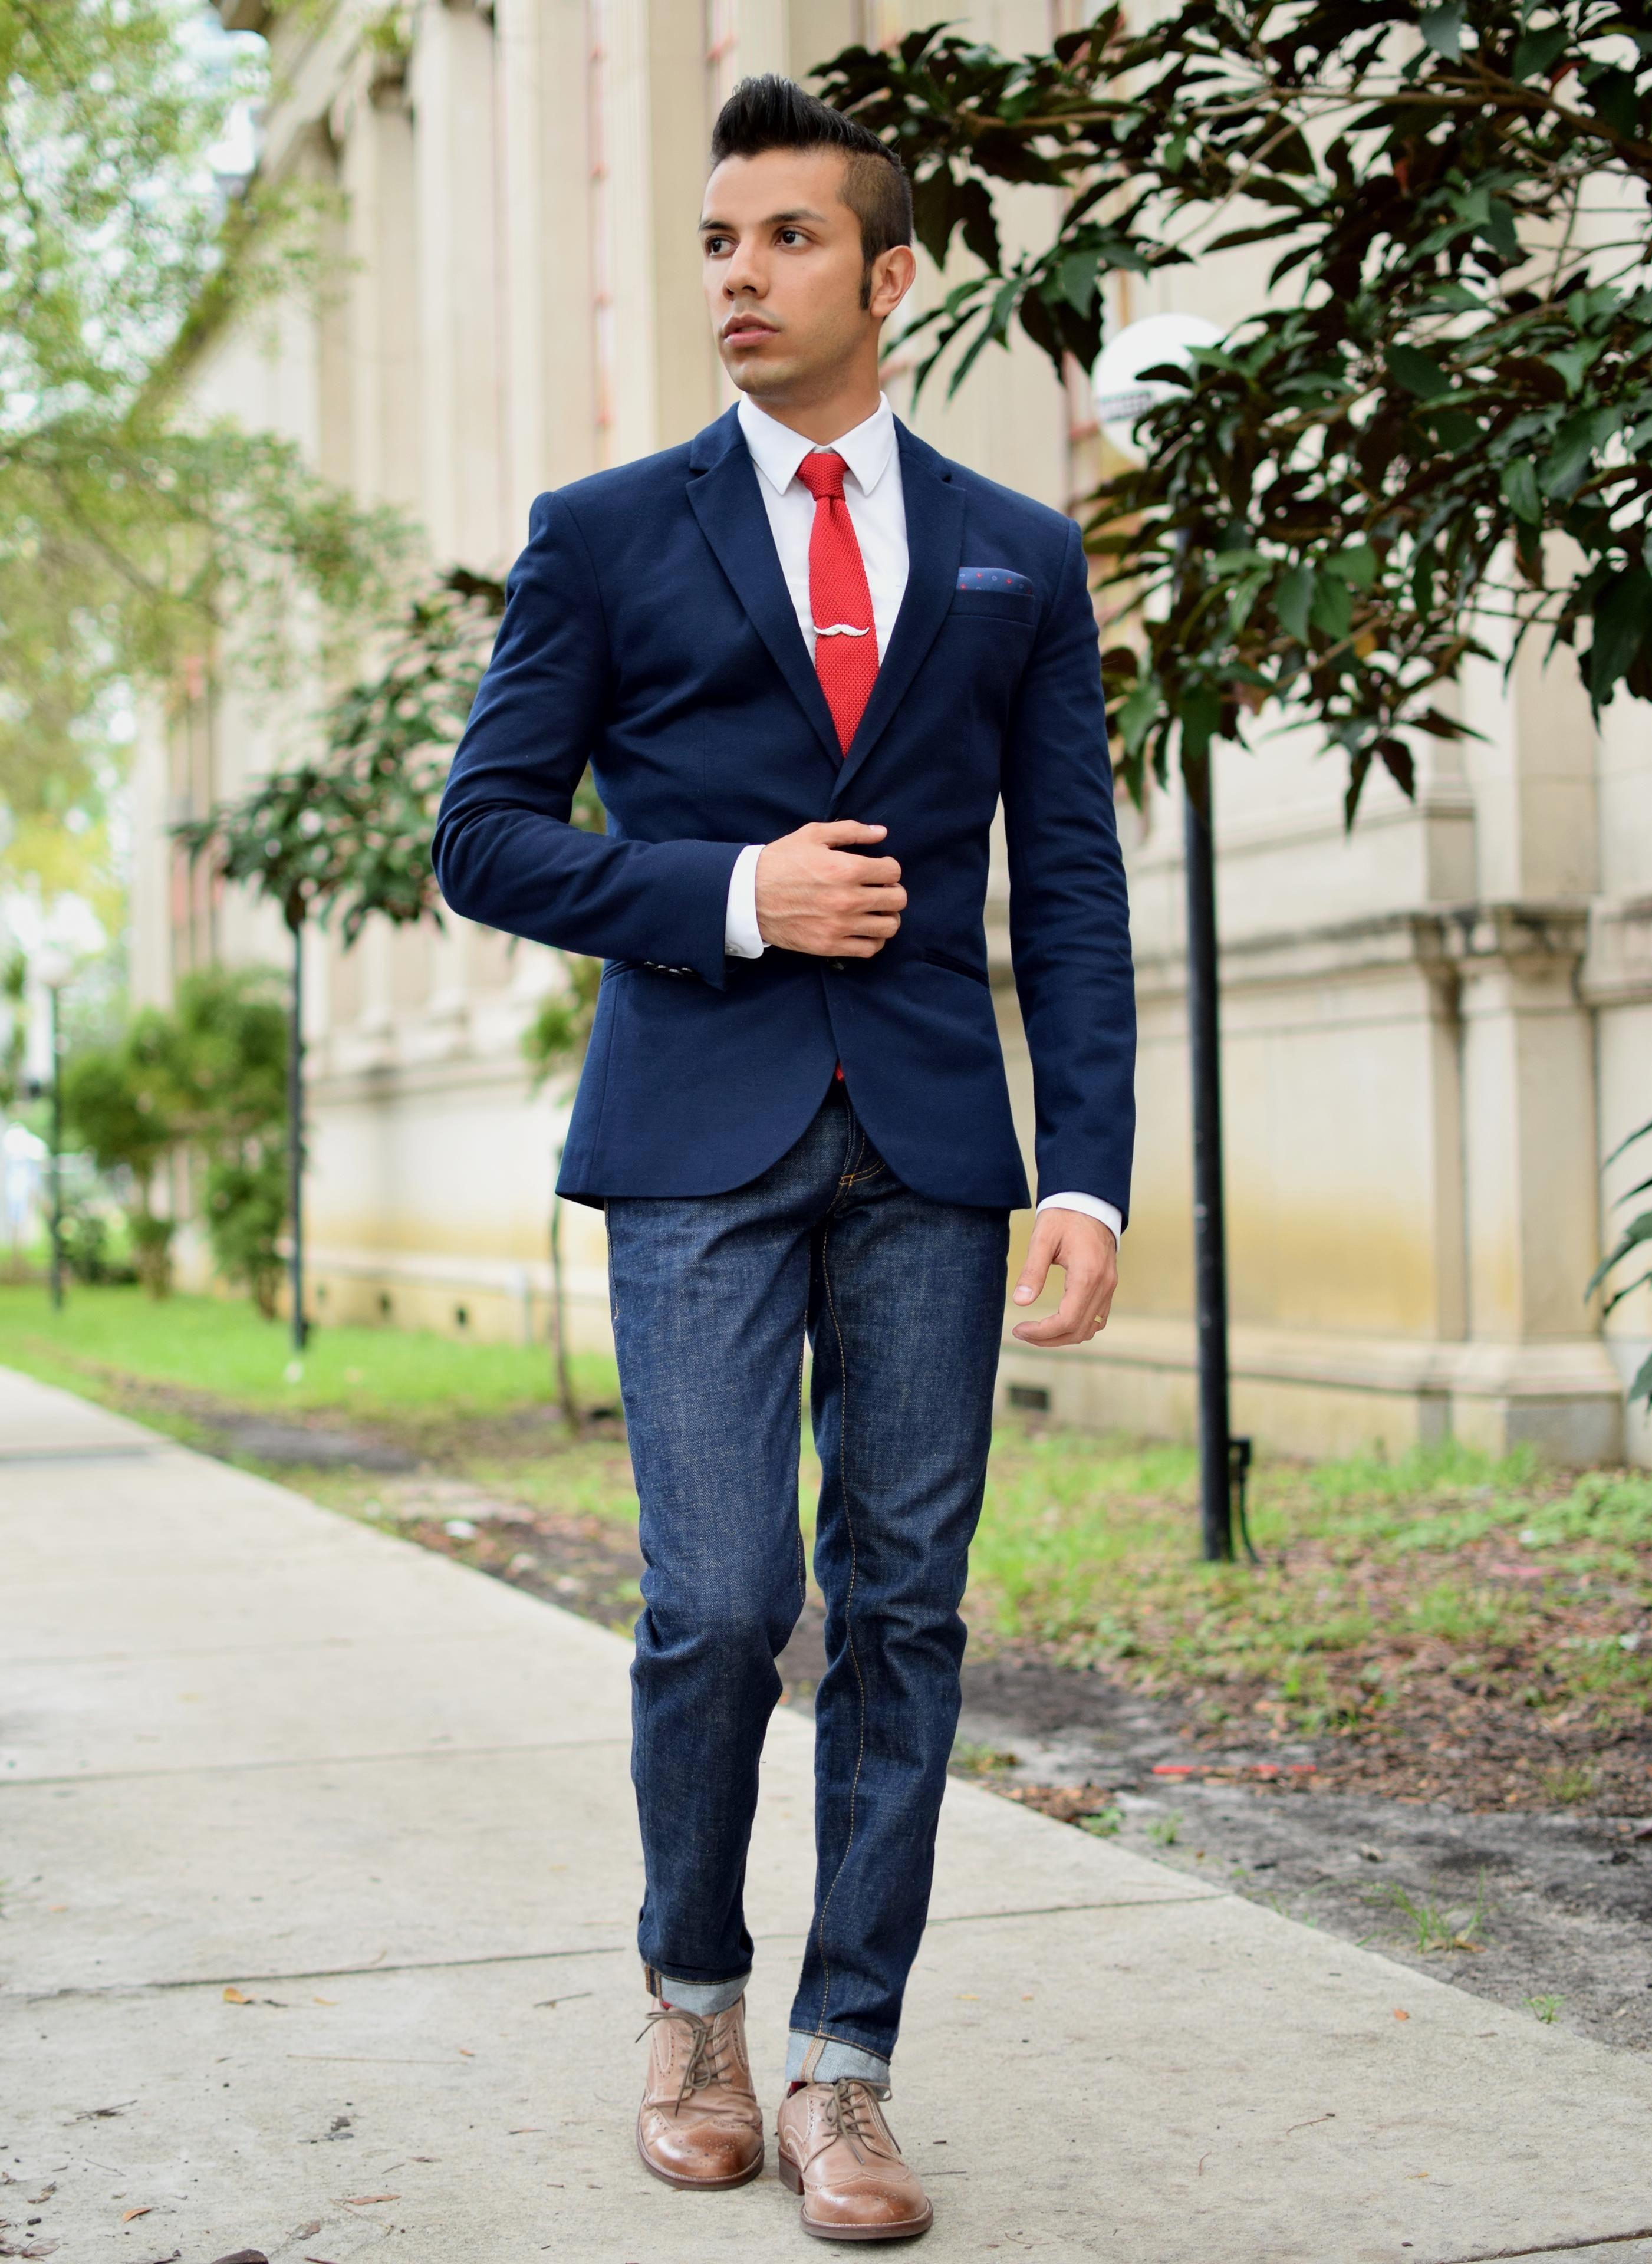 Black dress navy blazer - Men S Navy Blazer White Dress Shirt Navy Jeans Tan Leather Derby Shoes